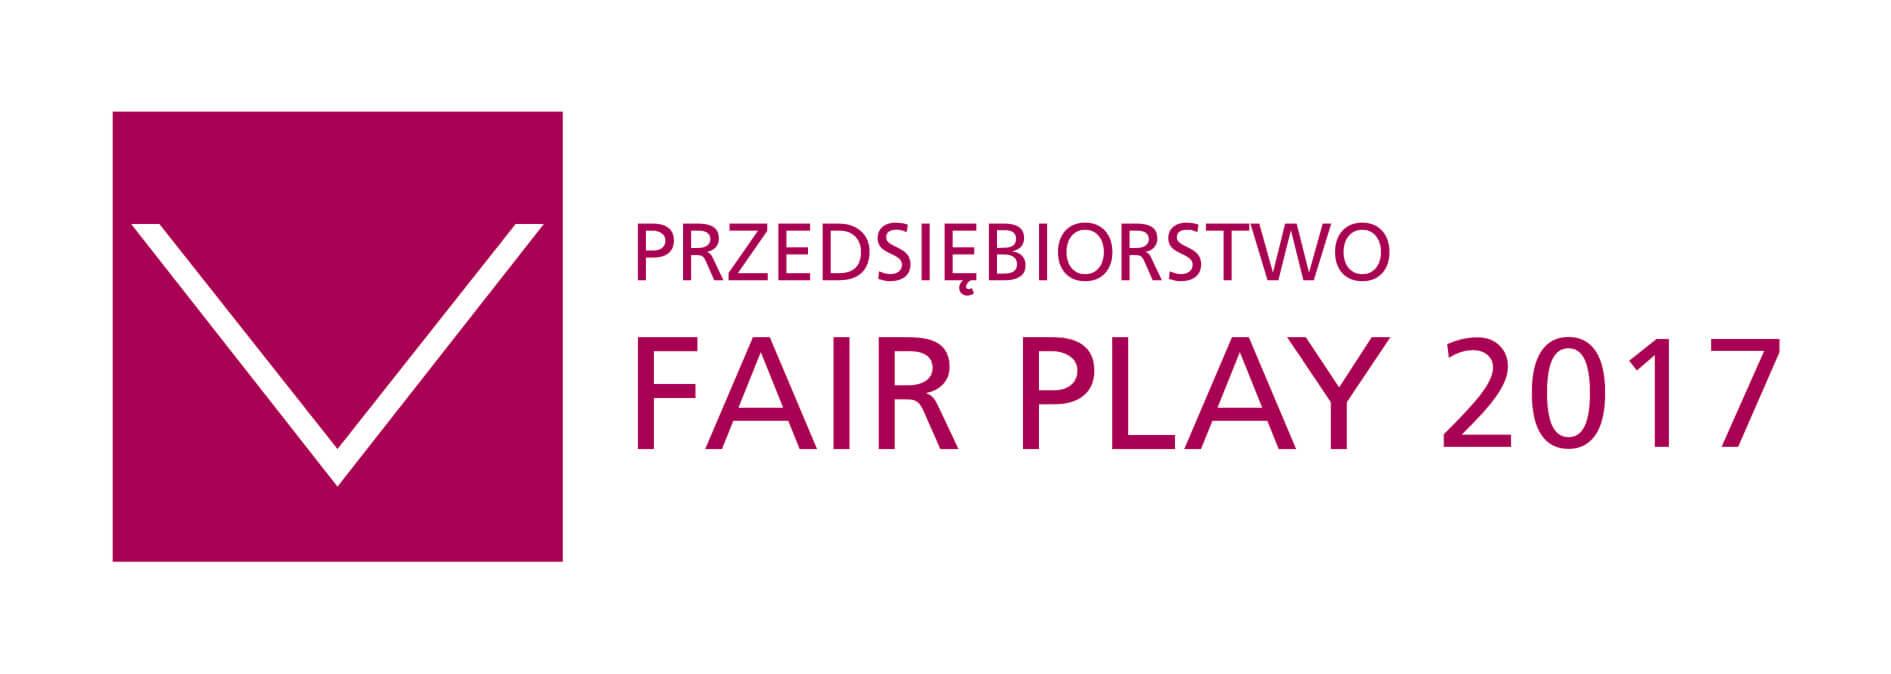 Logo of Fair Play Company 2017